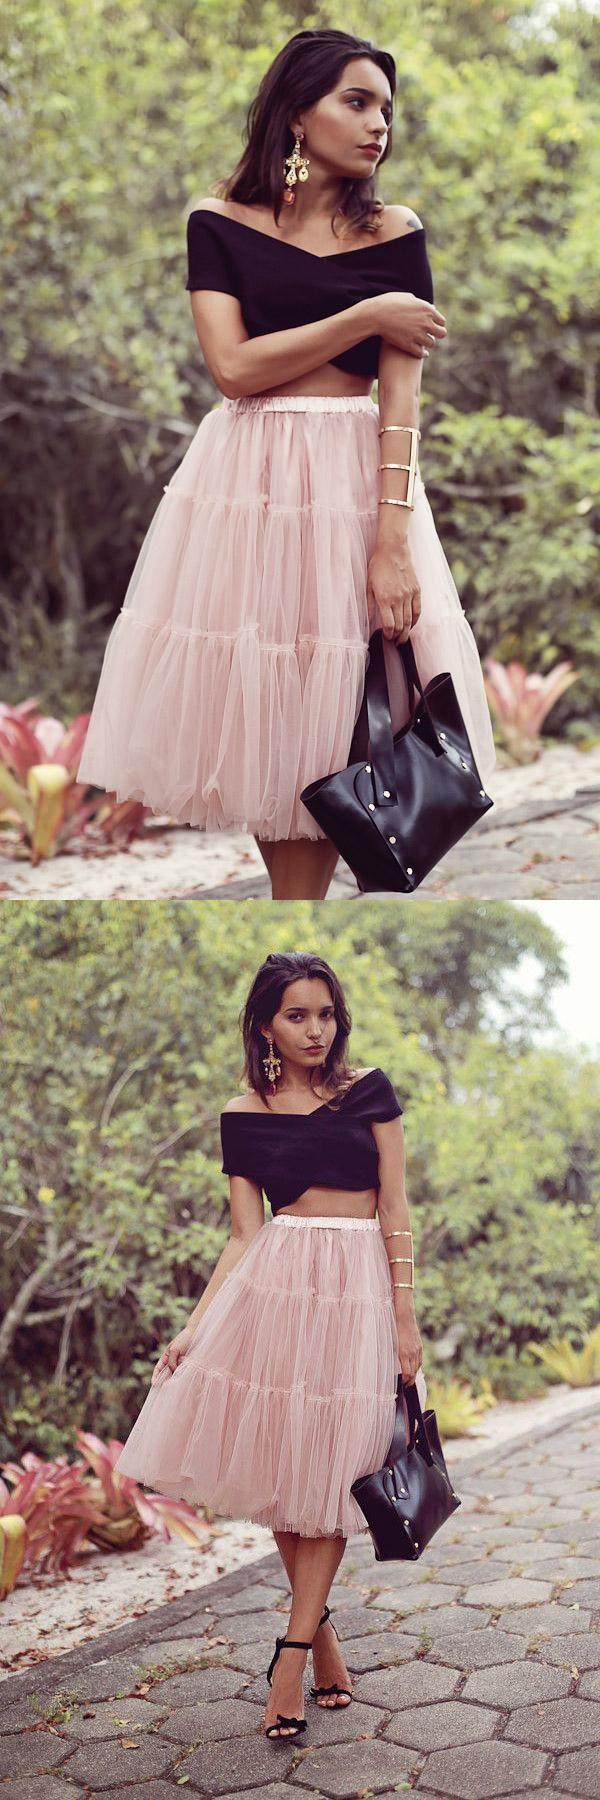 blush pink tutu skirt, bridesmaid dress, short bridesmaid dress, blush pink bridesmaid dress